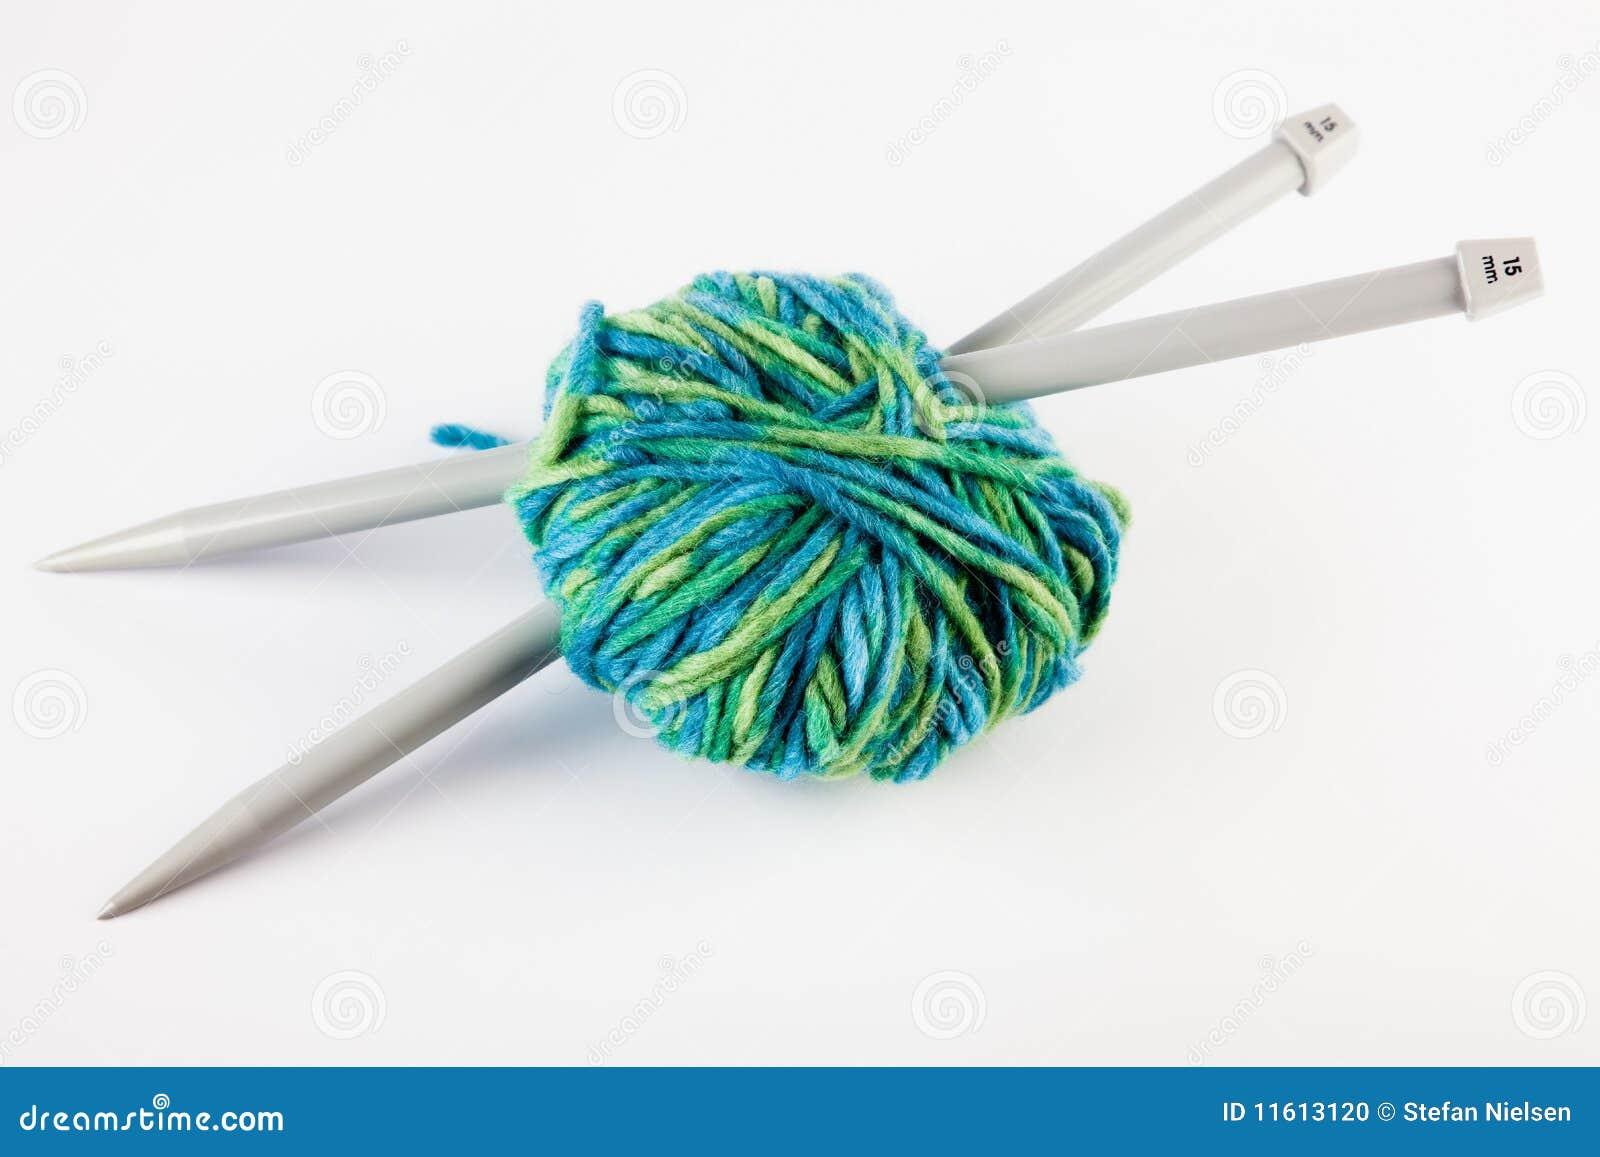 Knitting Needles And Yarn Stock Photo - Image: 11613120